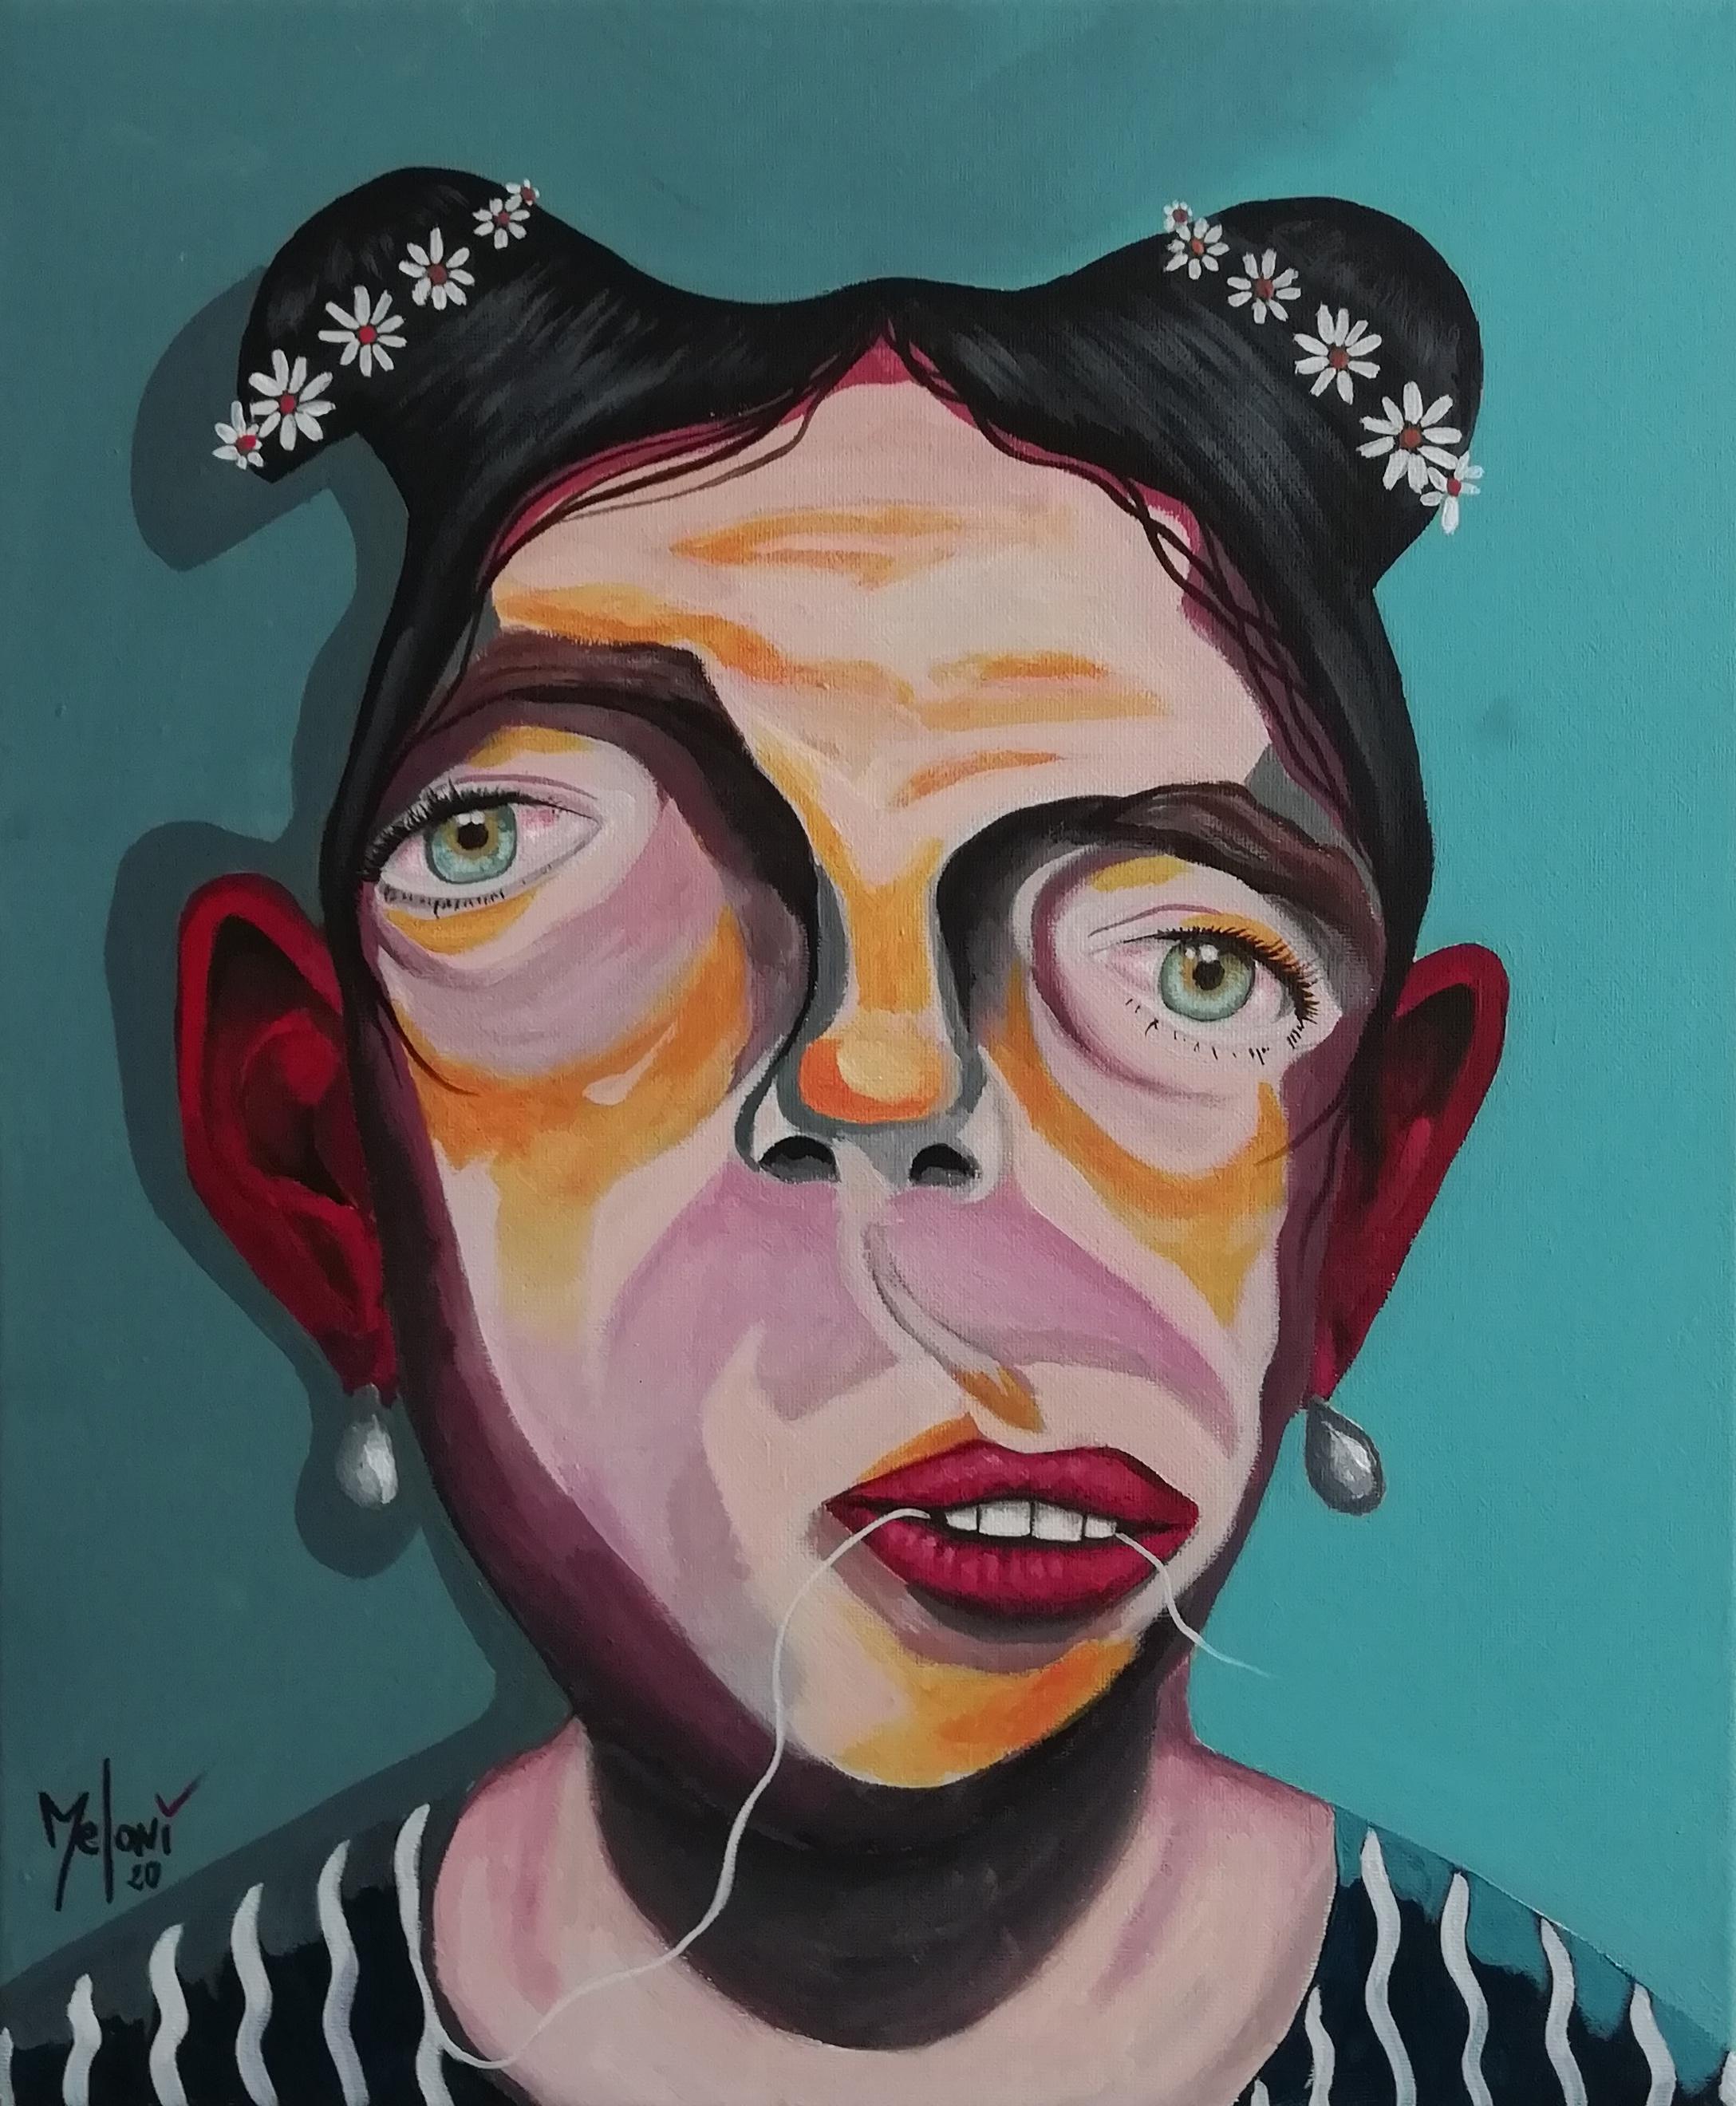 Franco Meloni Corona Covid Lockdown Virus Themed Art